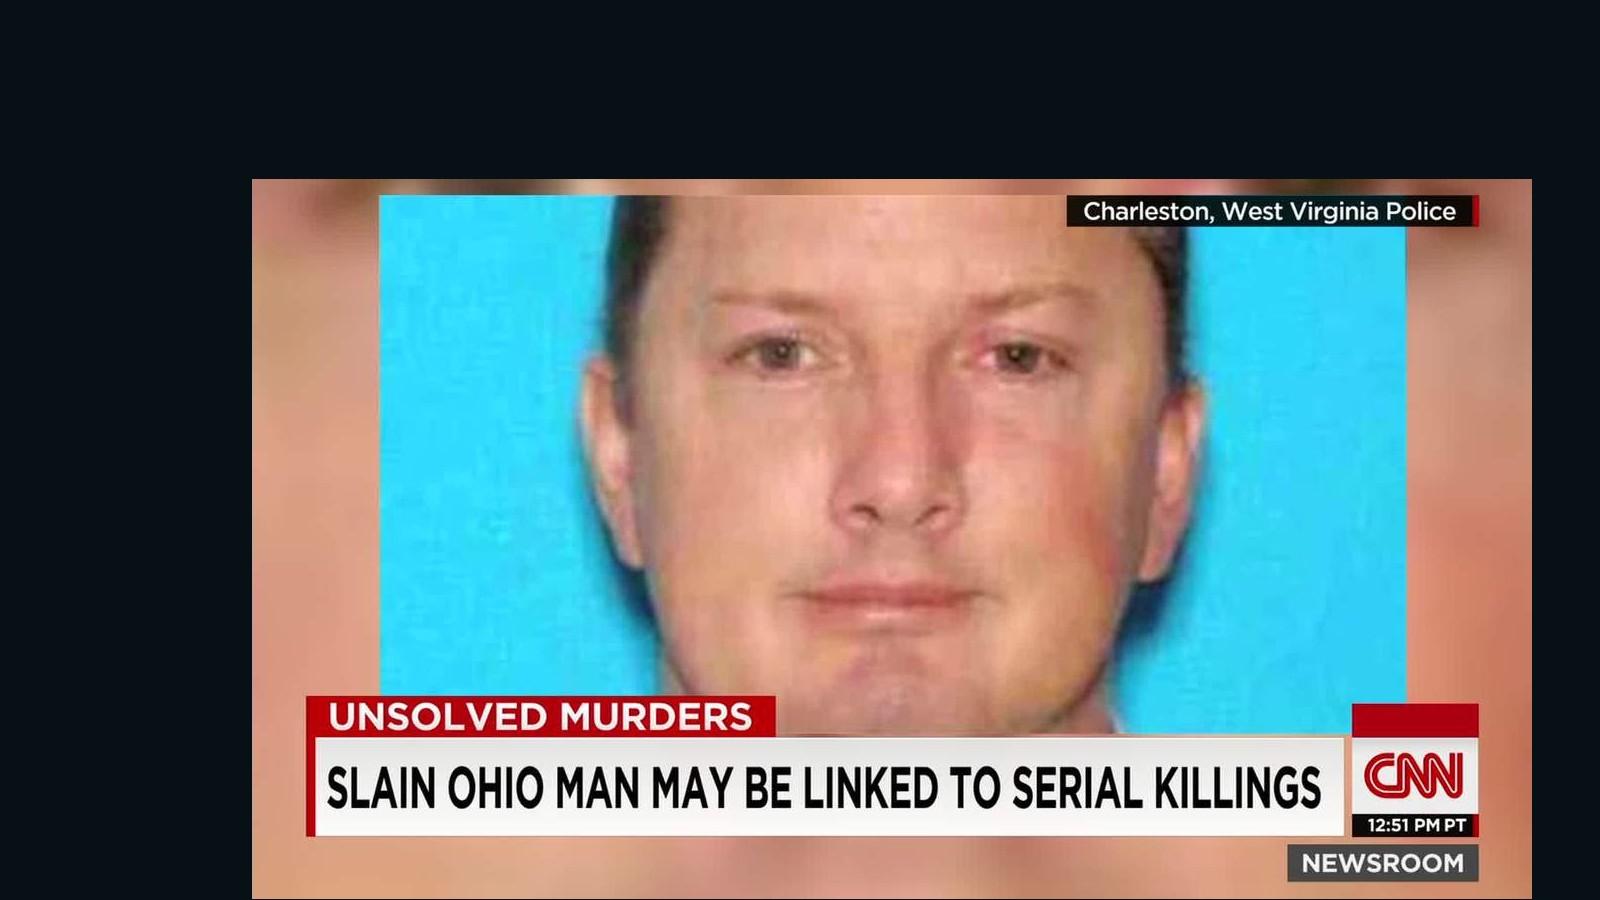 Self-defense killing: Attacker tied to unsolved crimes? - CNN